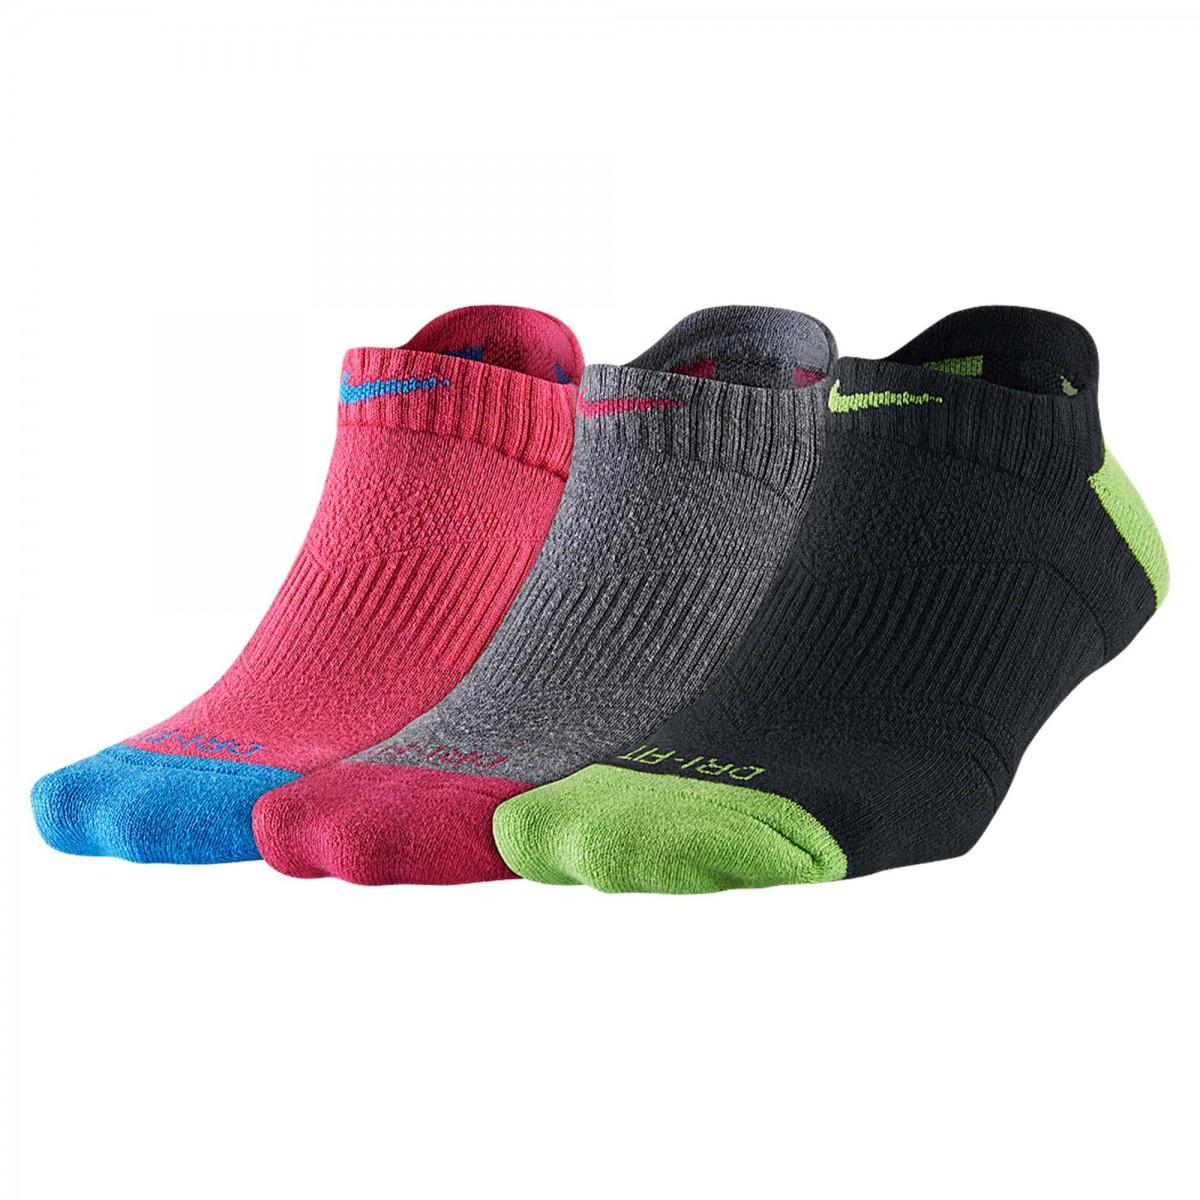 Kit Meias Nike Dri - Fit Cushion 3PPK Sx4841 - 951 Preto / cinza / rosa